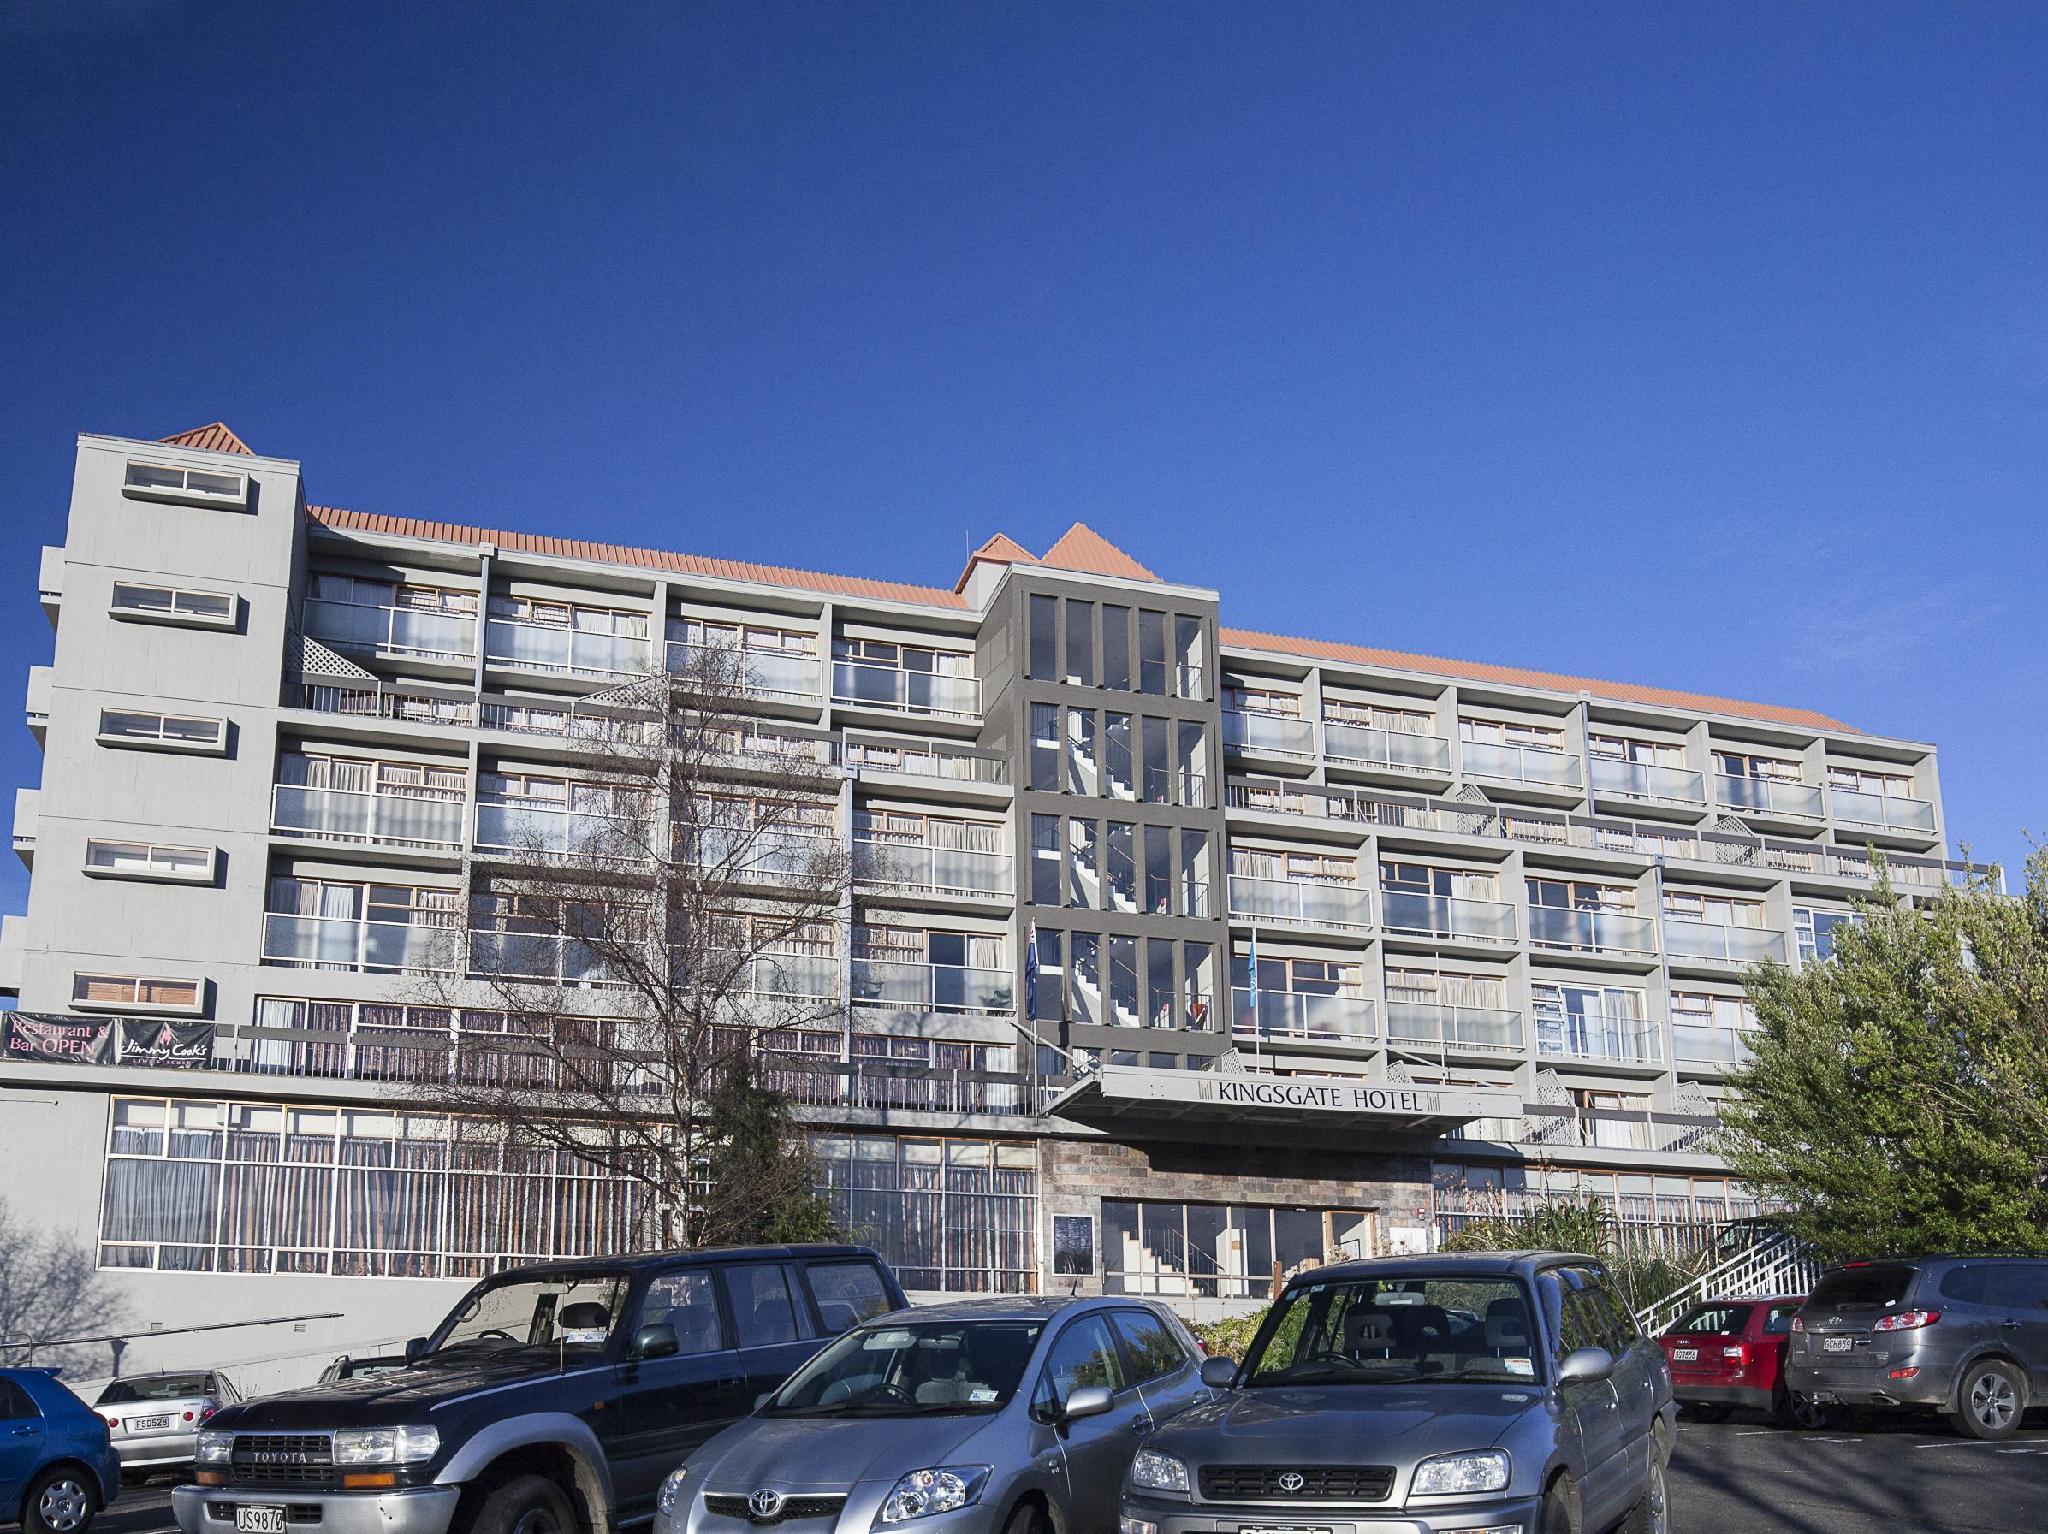 Kingsgate Hotel Dunedin